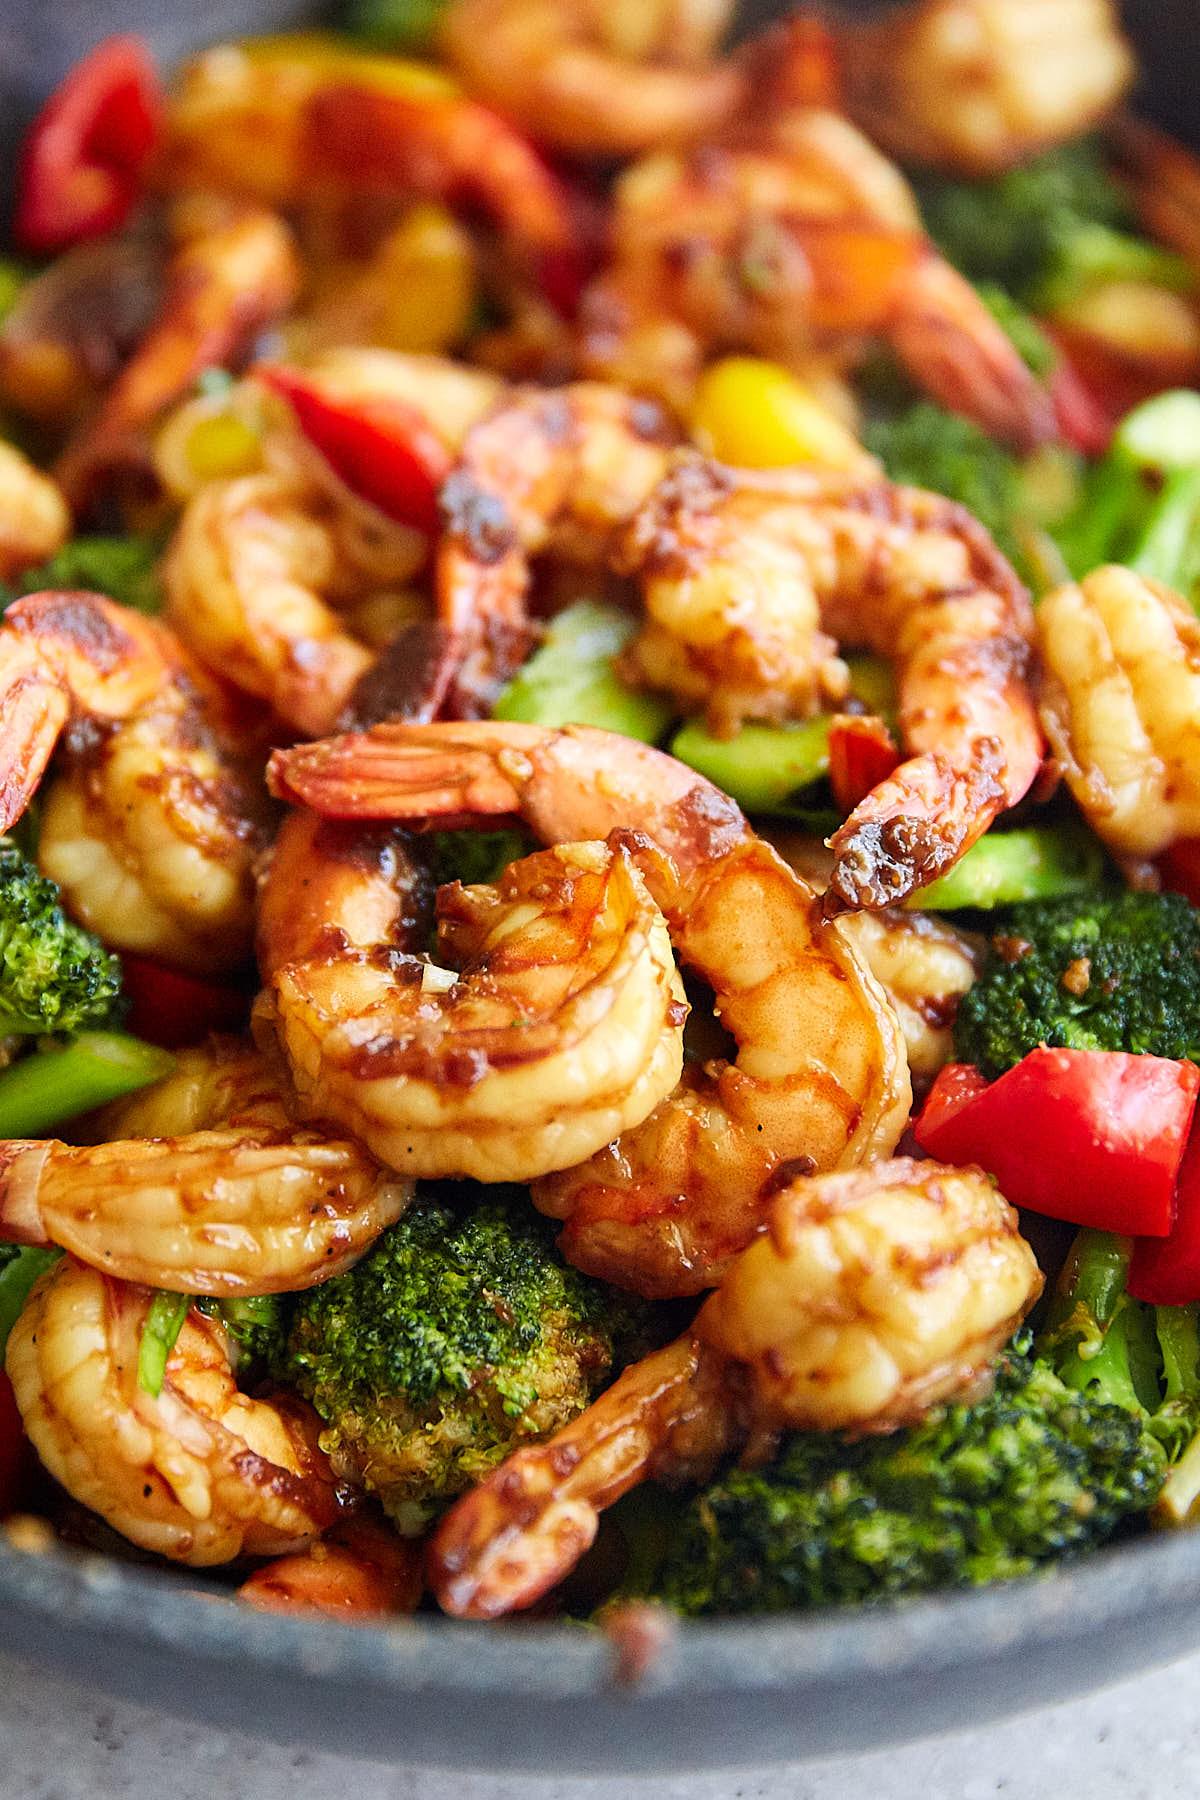 Szechuan shrimp with vegetables in a wok.